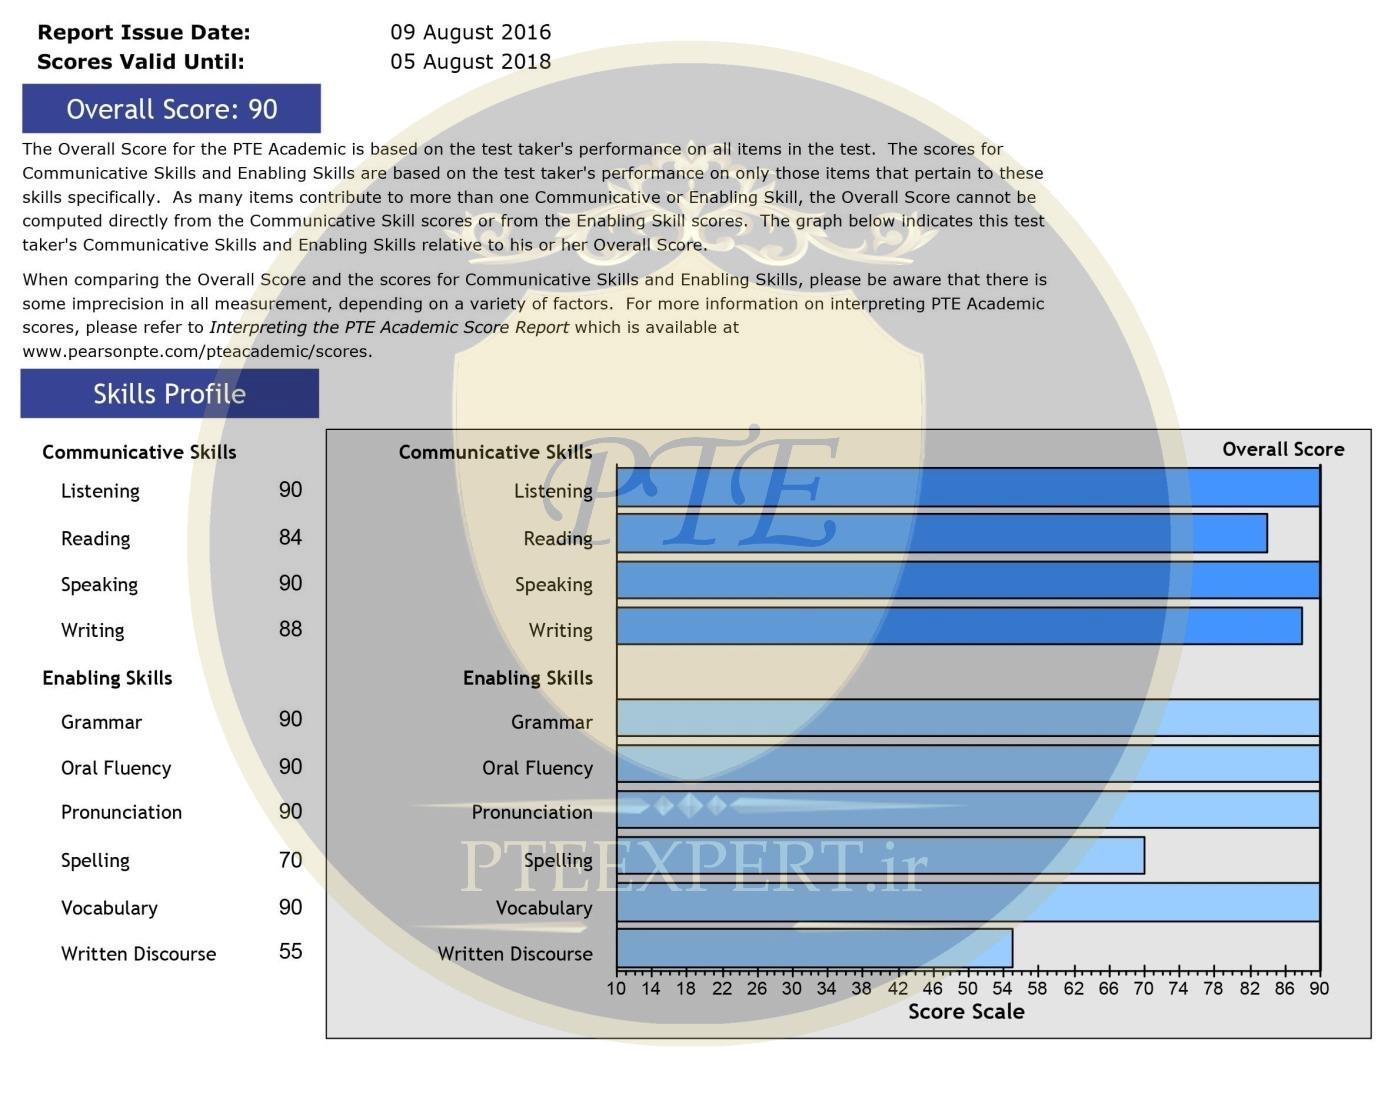 تحلیل کارنامه آزمون PTE